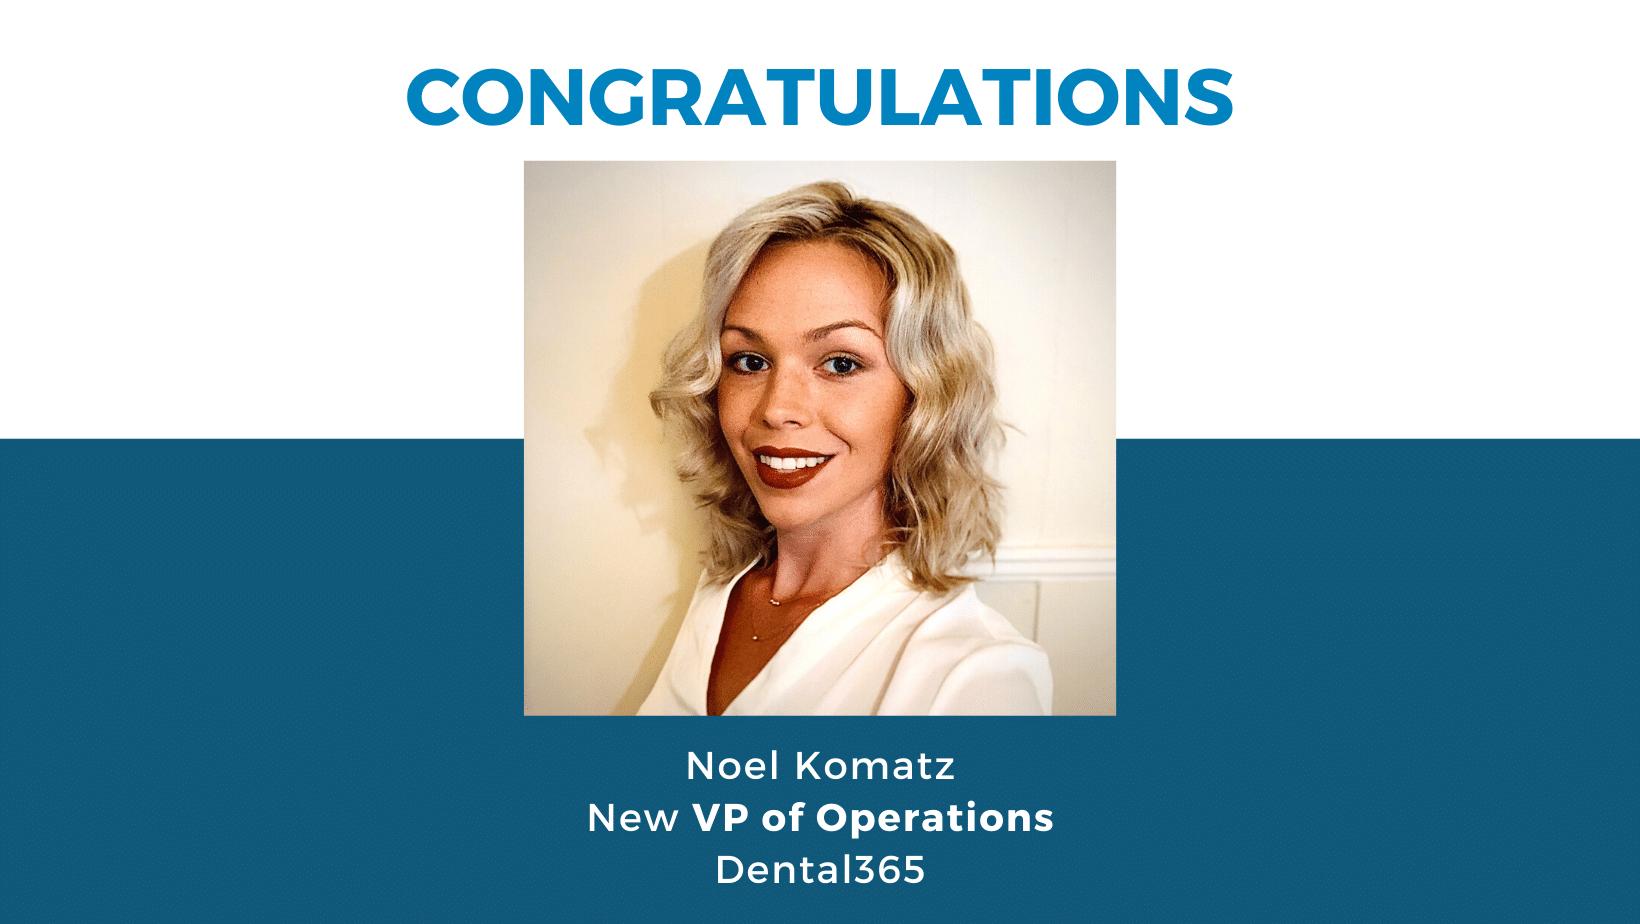 Dental365 promotes Noel Komatz to VP of Operations